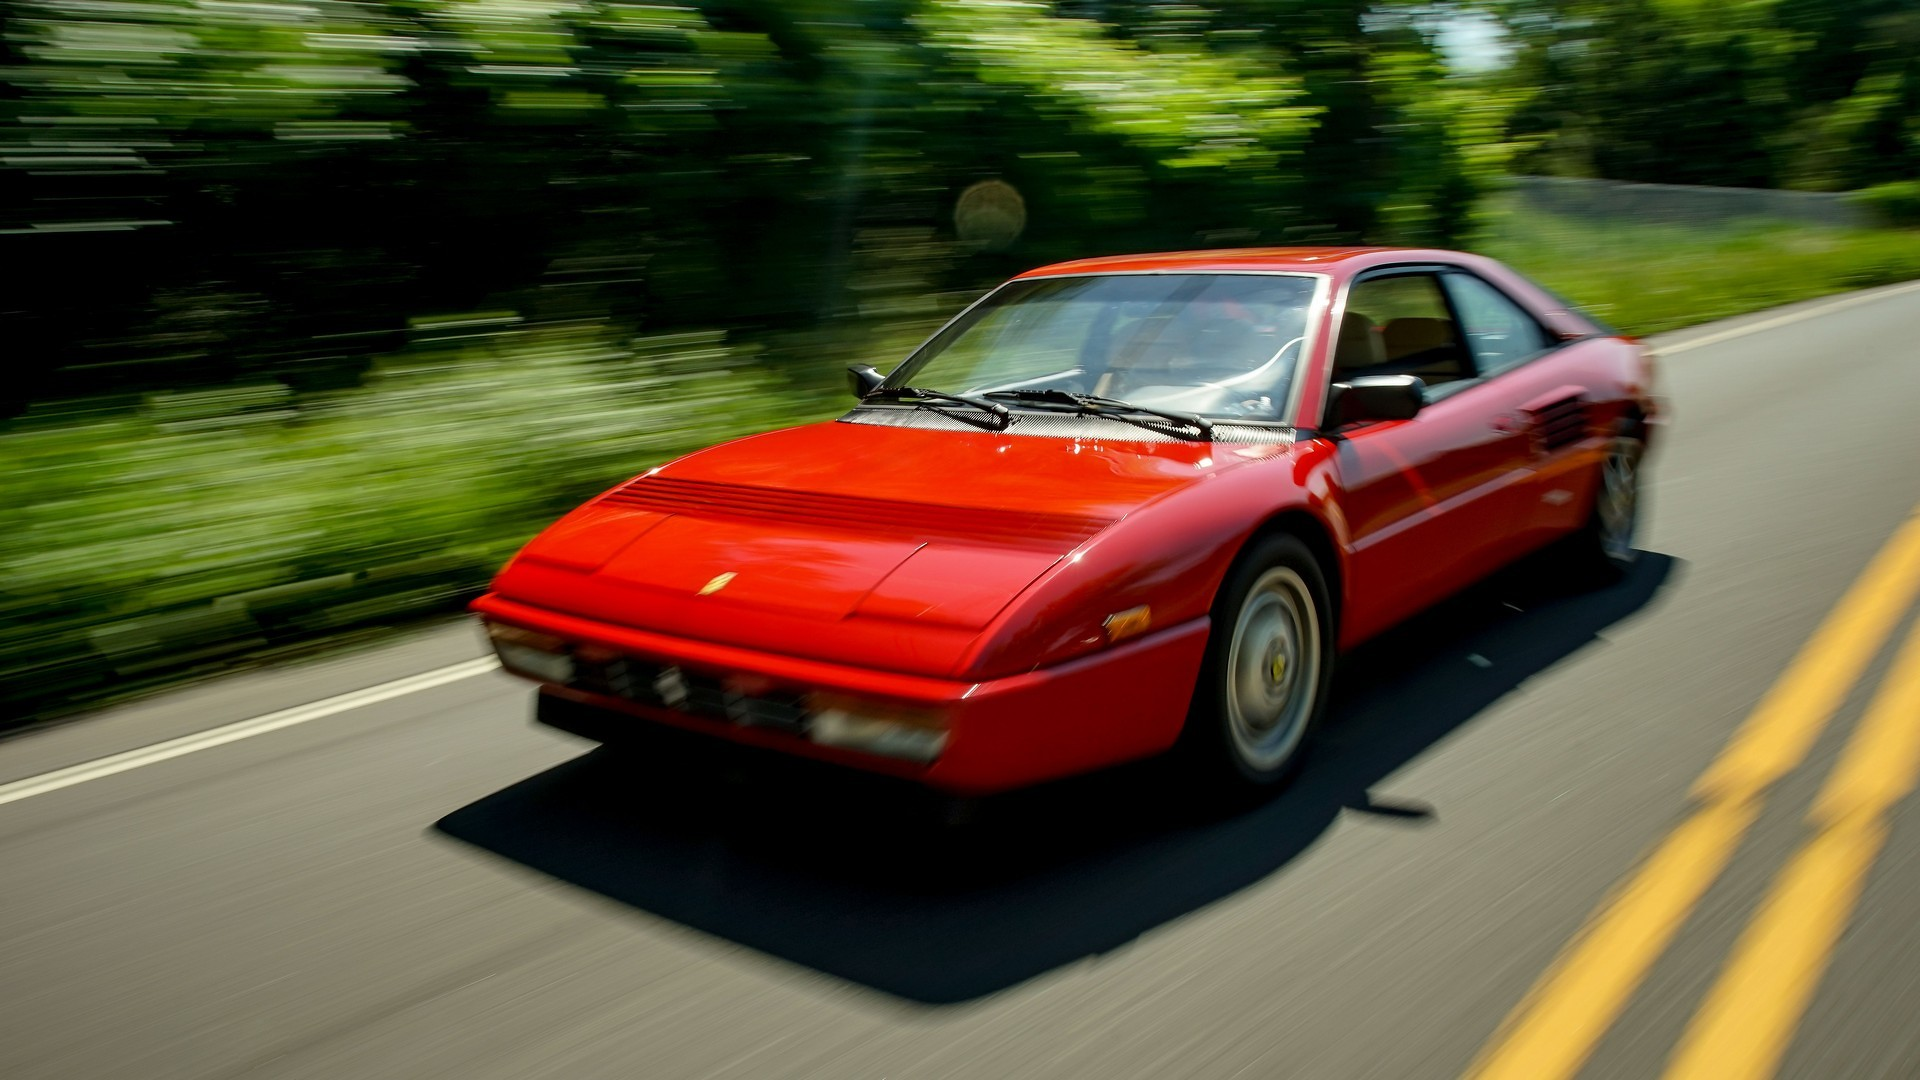 1989-ferrari-mondial-t Fabulous Ferrari Mondial T In Vendita Cars Trend